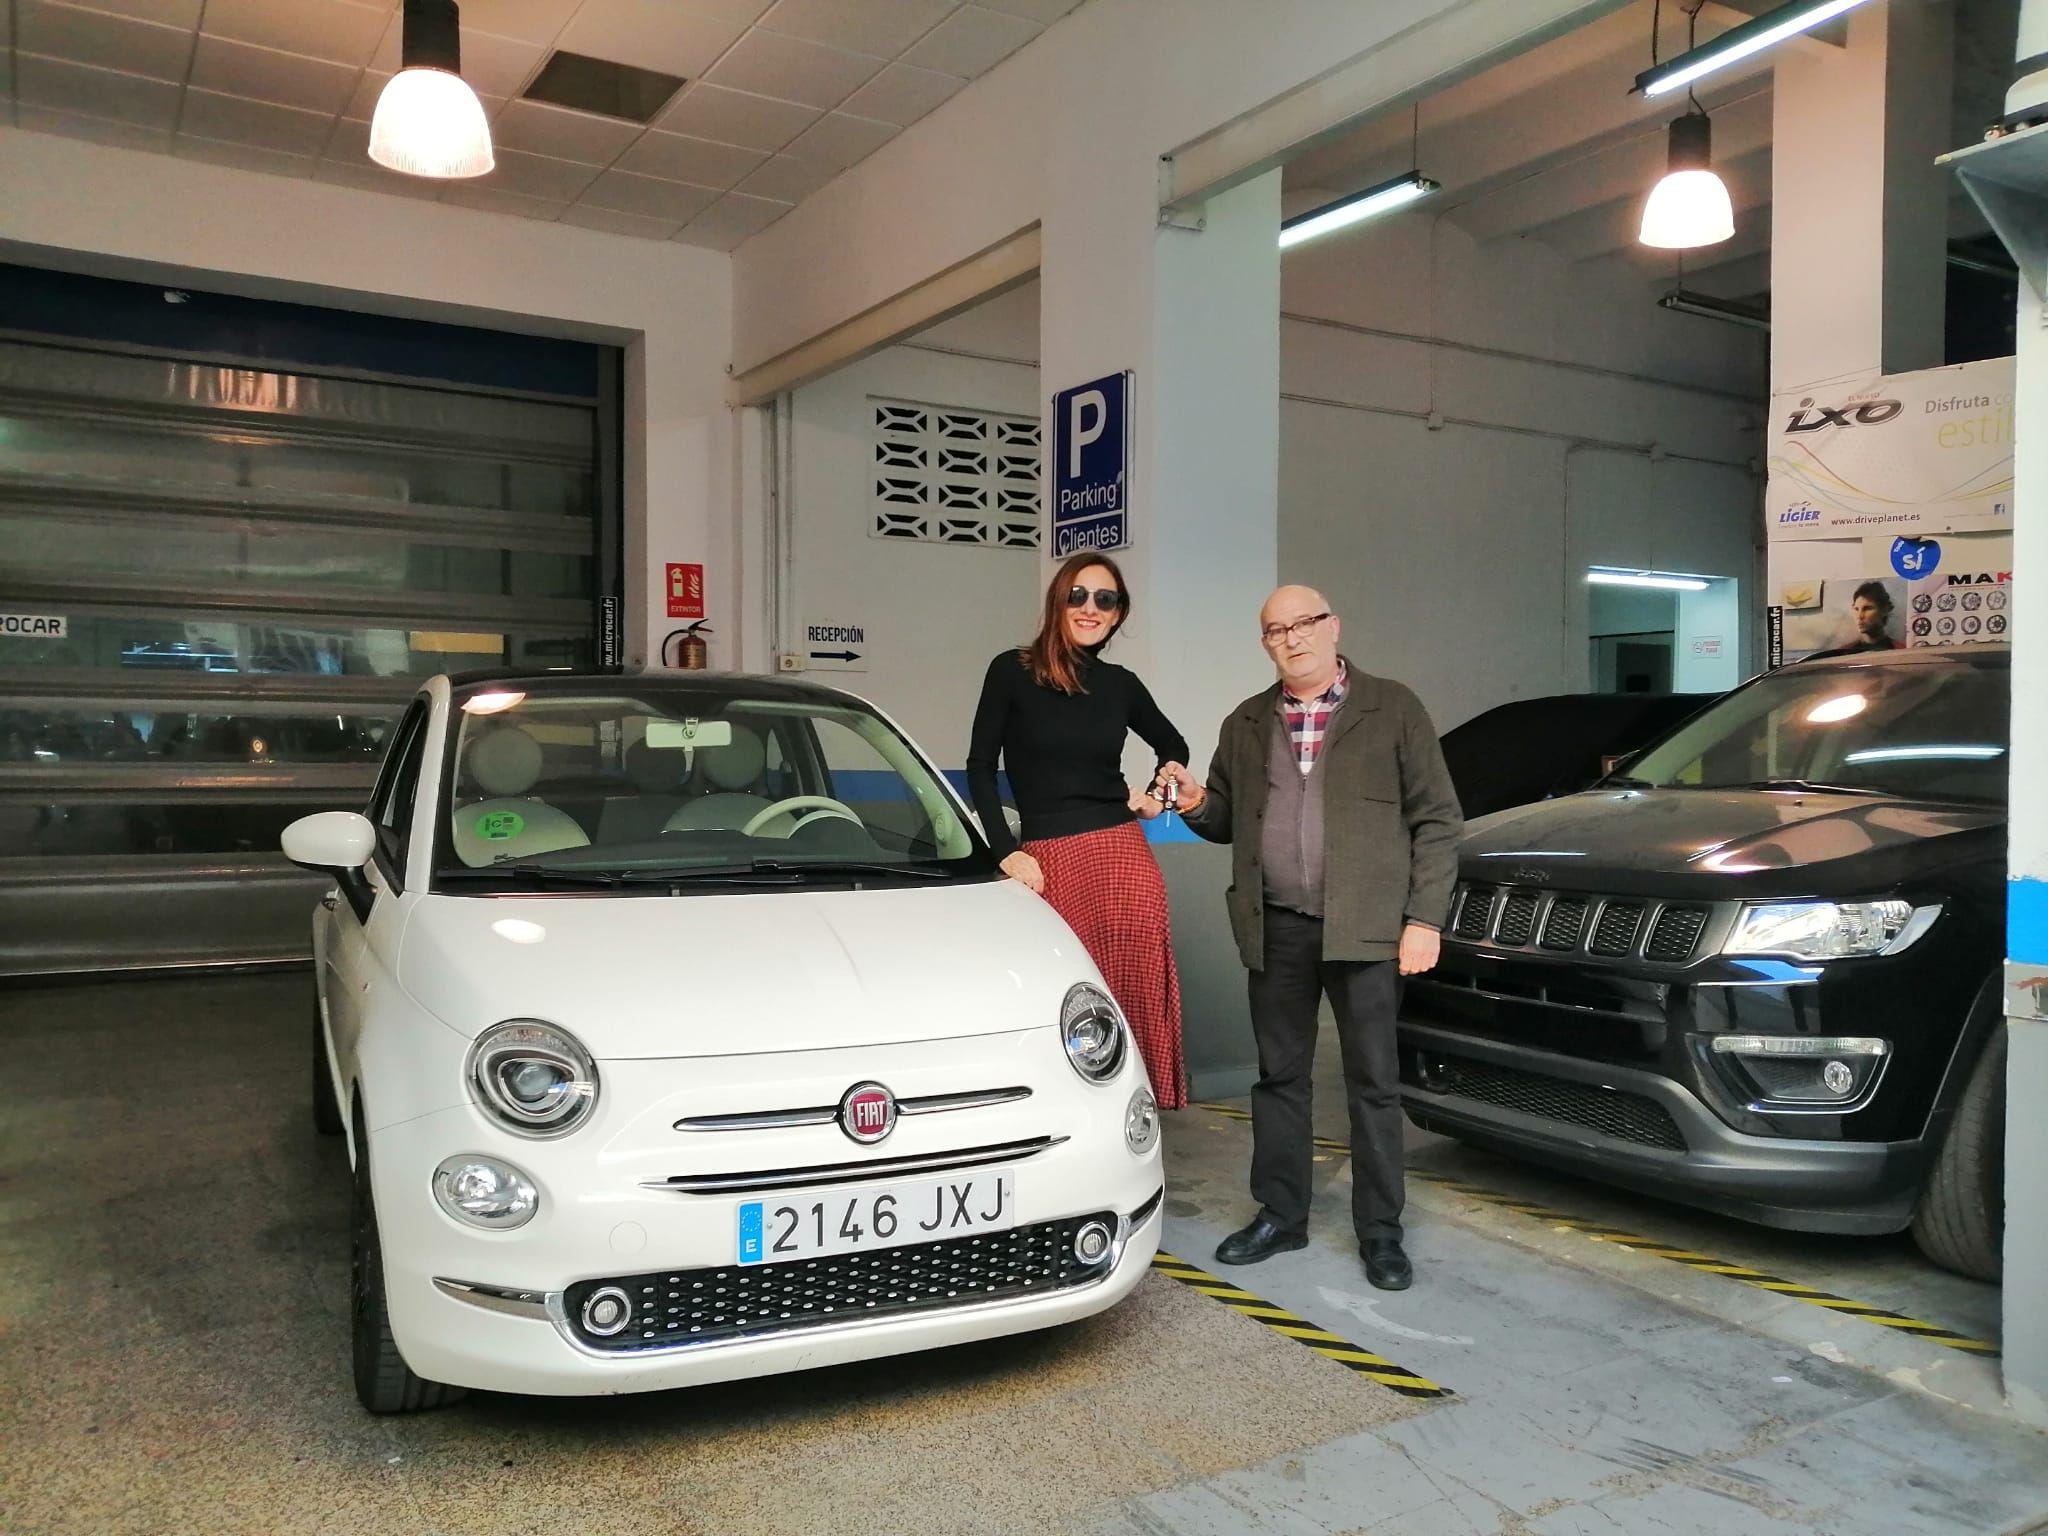 Milautomóviles hace entrega a Maite de un Fiat 500